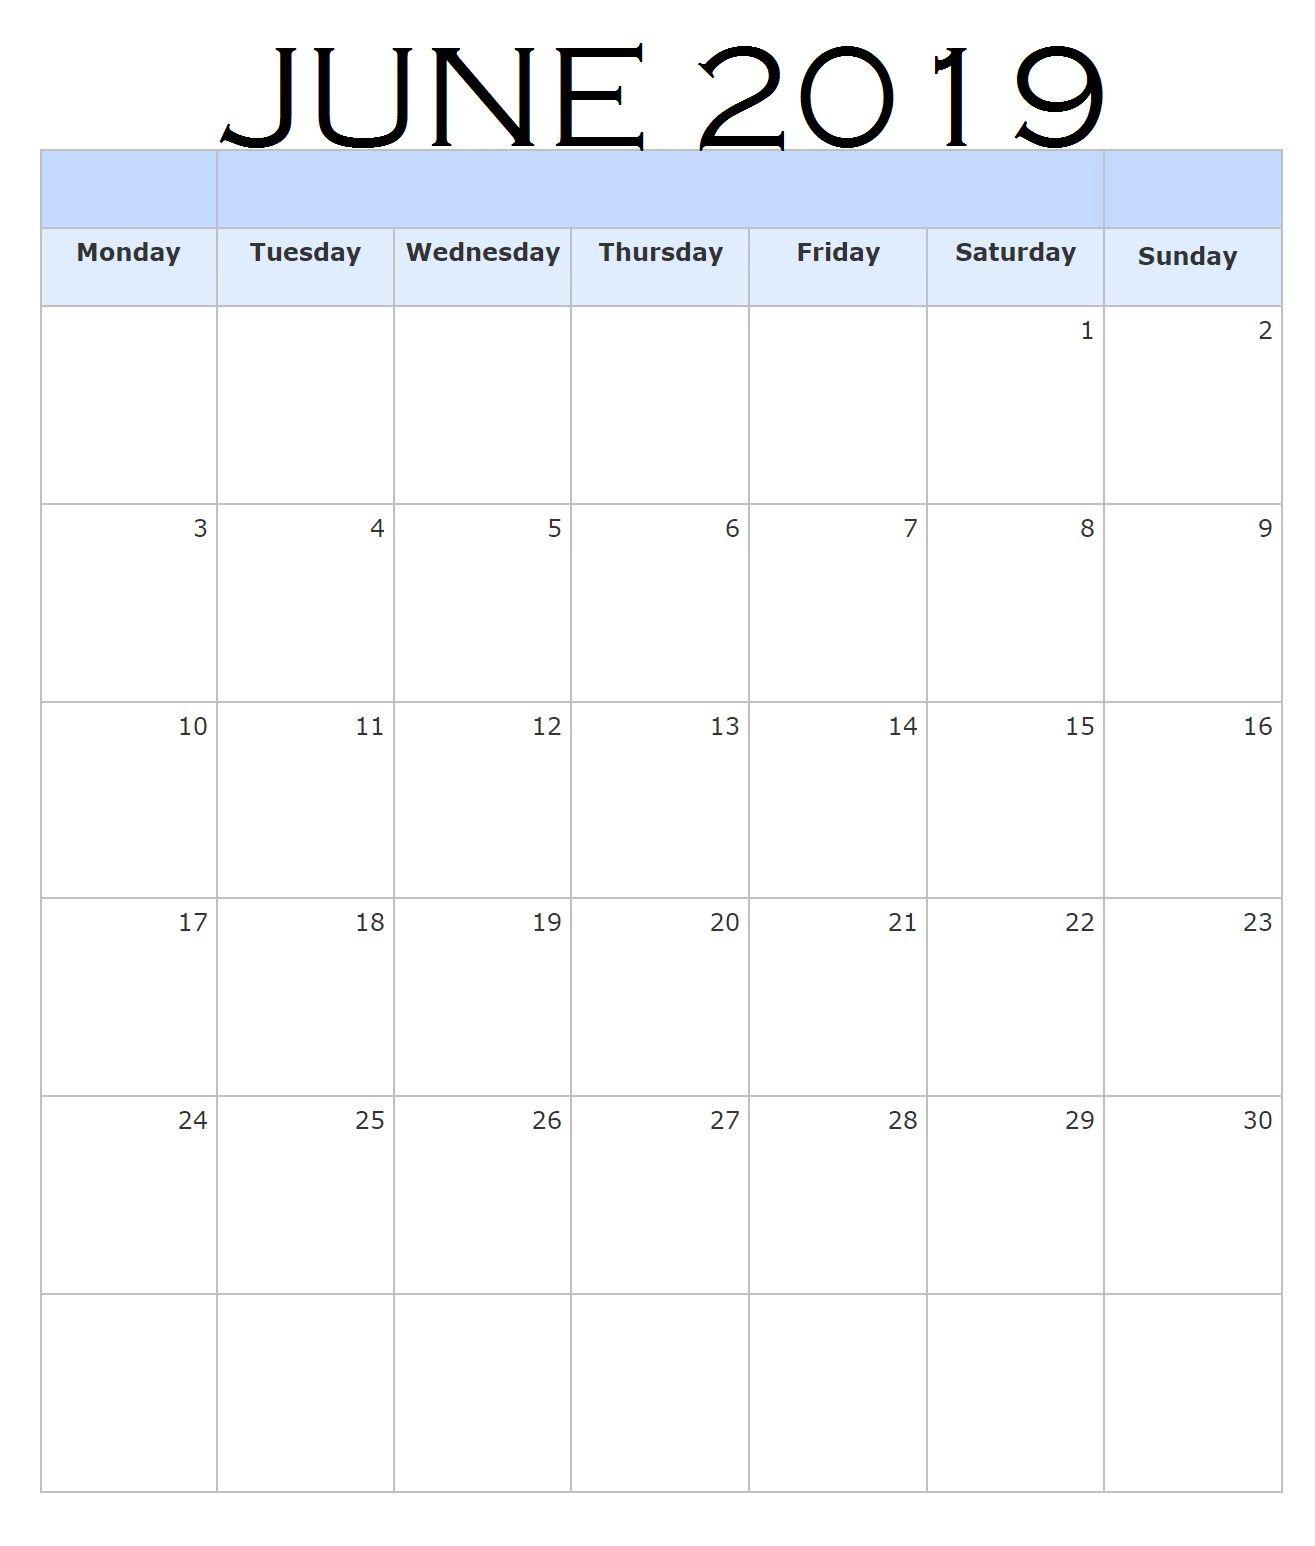 June 2019 Blank Templates Blank Calendar Template Calendar June